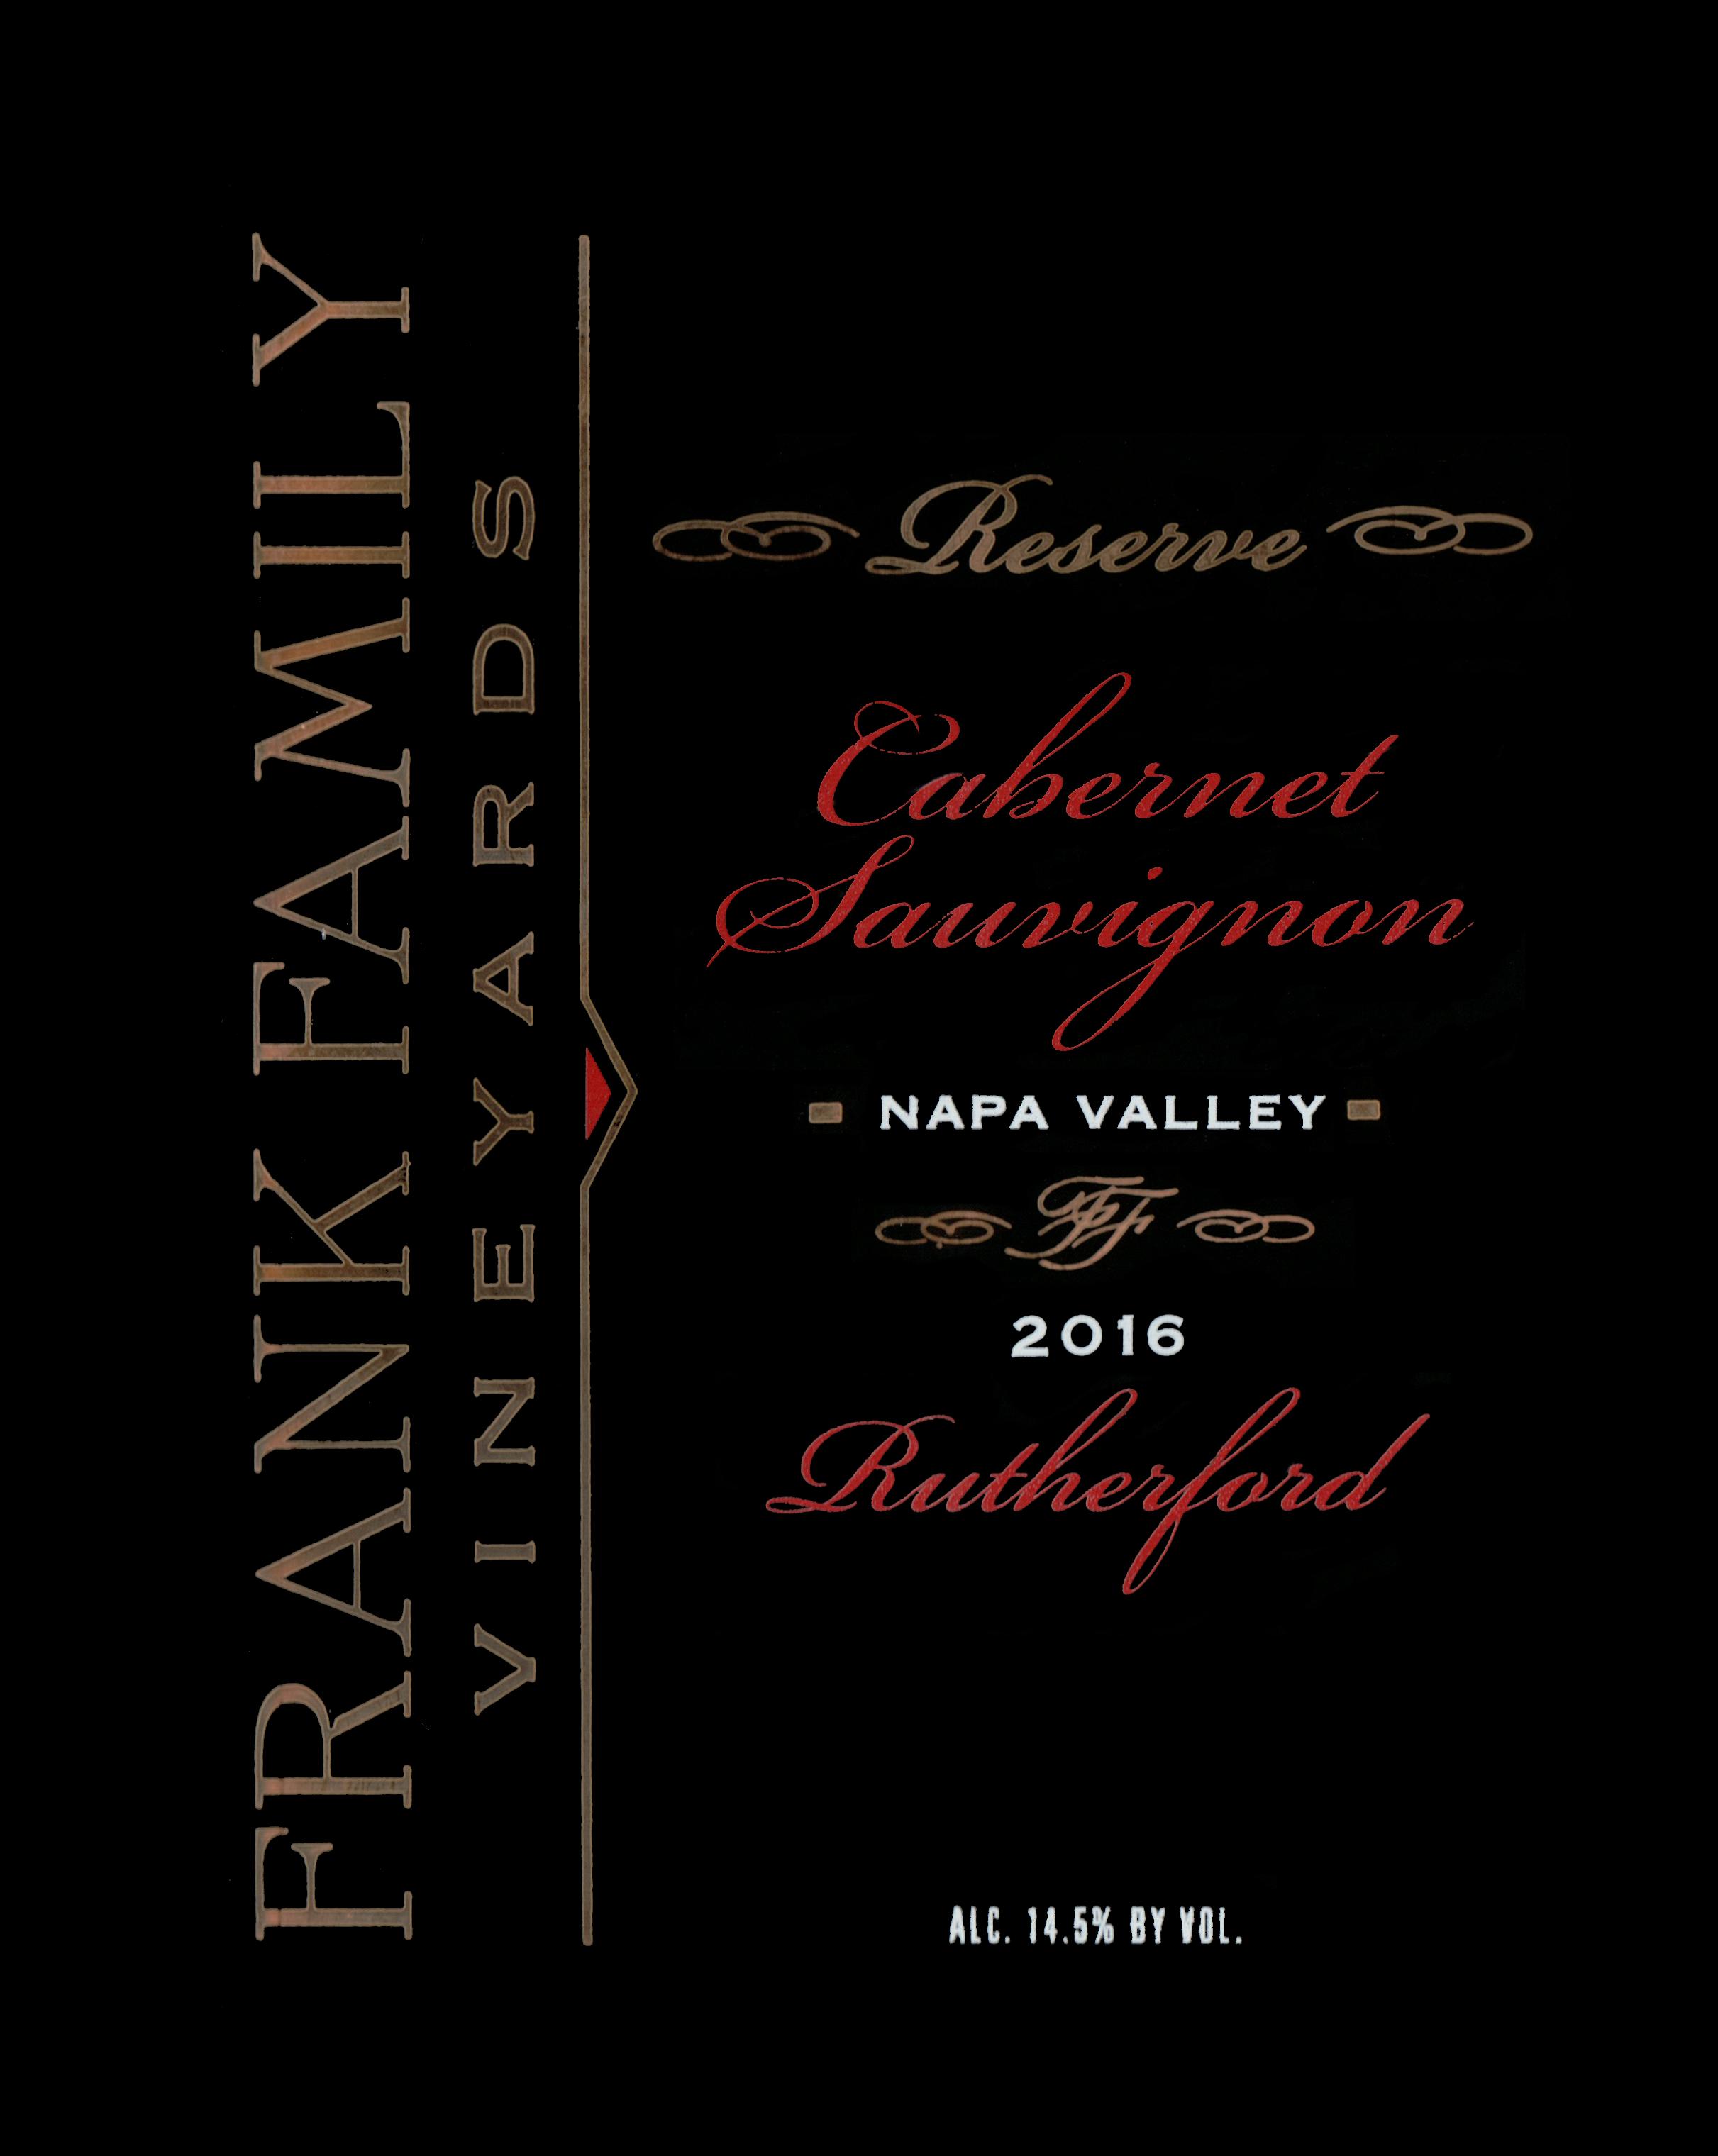 Frank Family Vineyards Reserve Cabernet Rutherford 2016